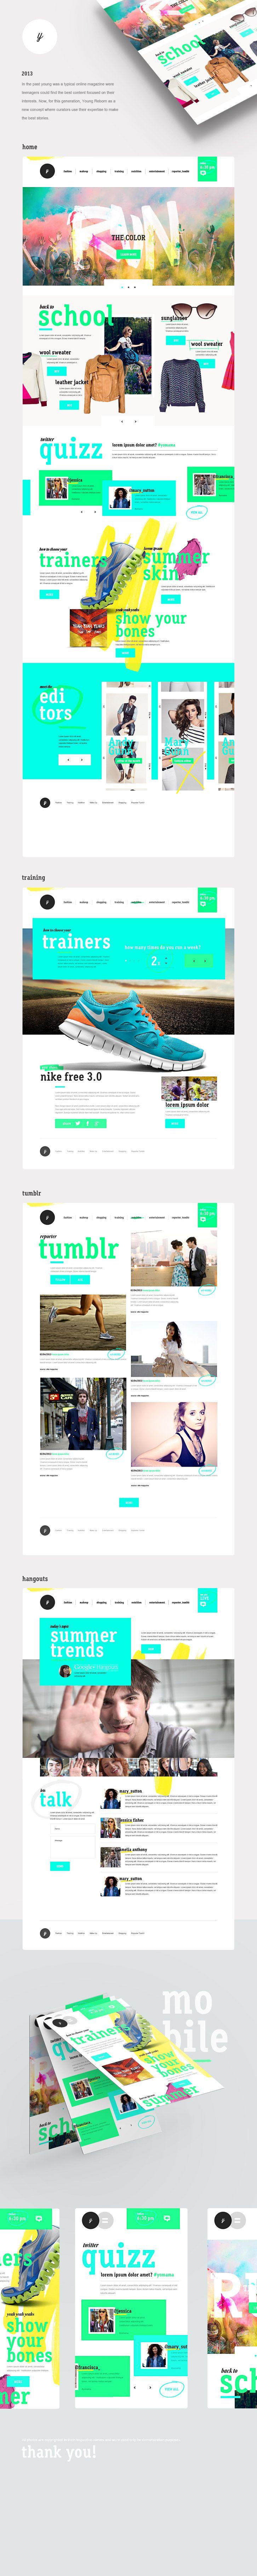 Online Magazine For Young Audiences By Isabel Sousa Intranet Design Web Design Tendances Web